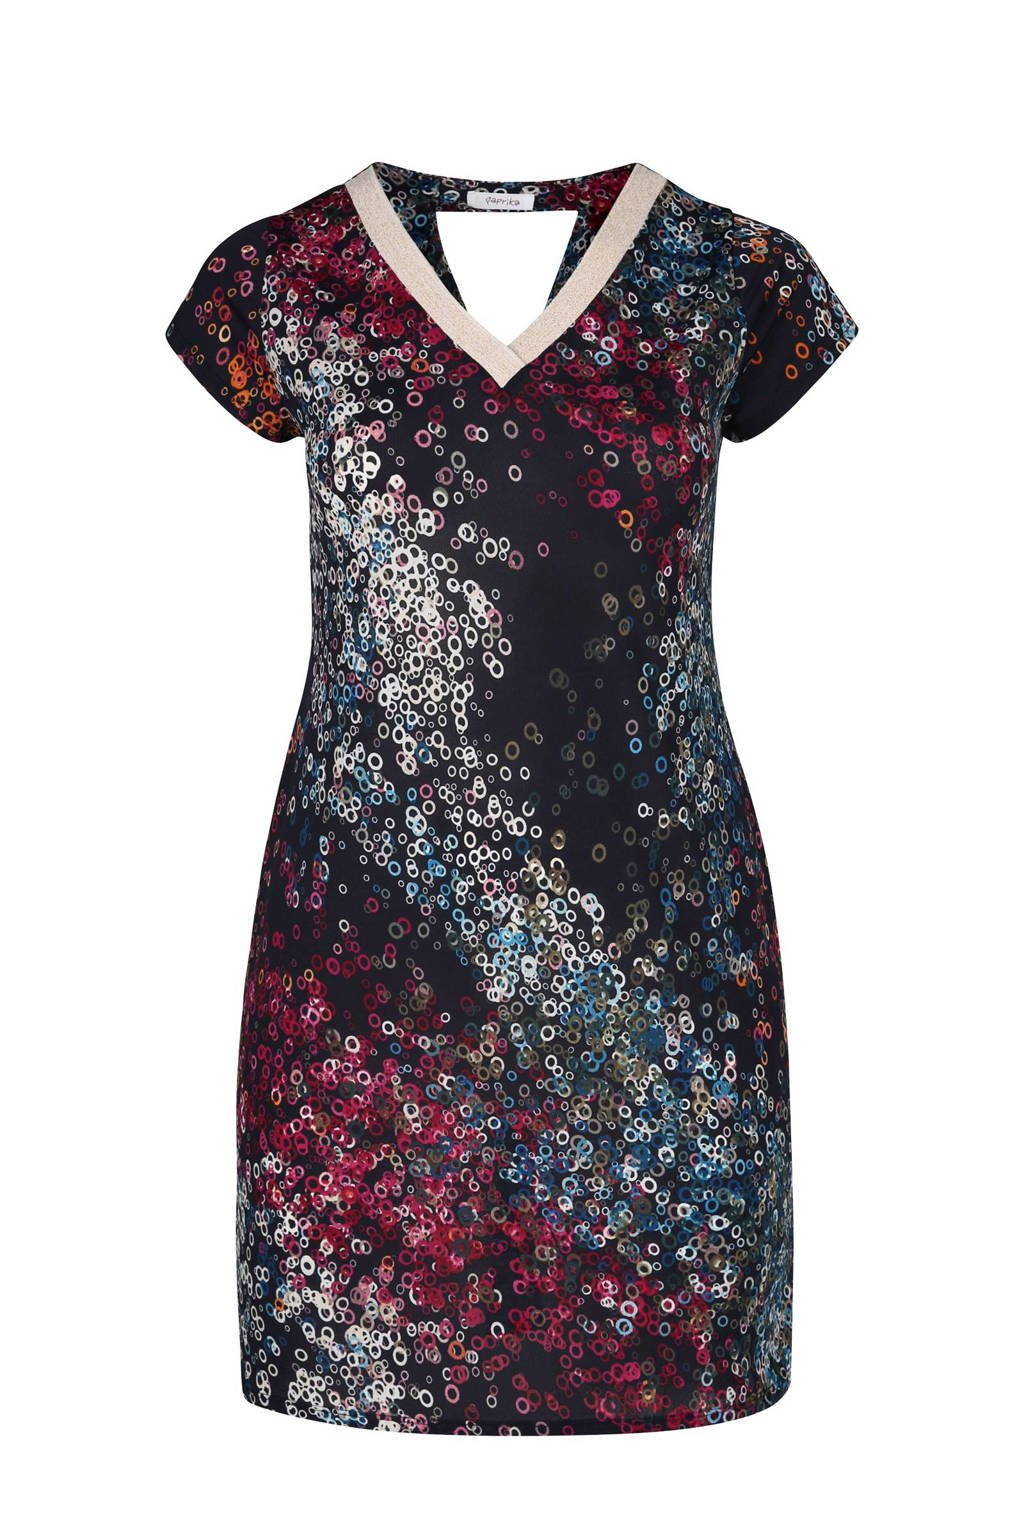 Paprika jurk paars, Paars/Zwart/Blauw